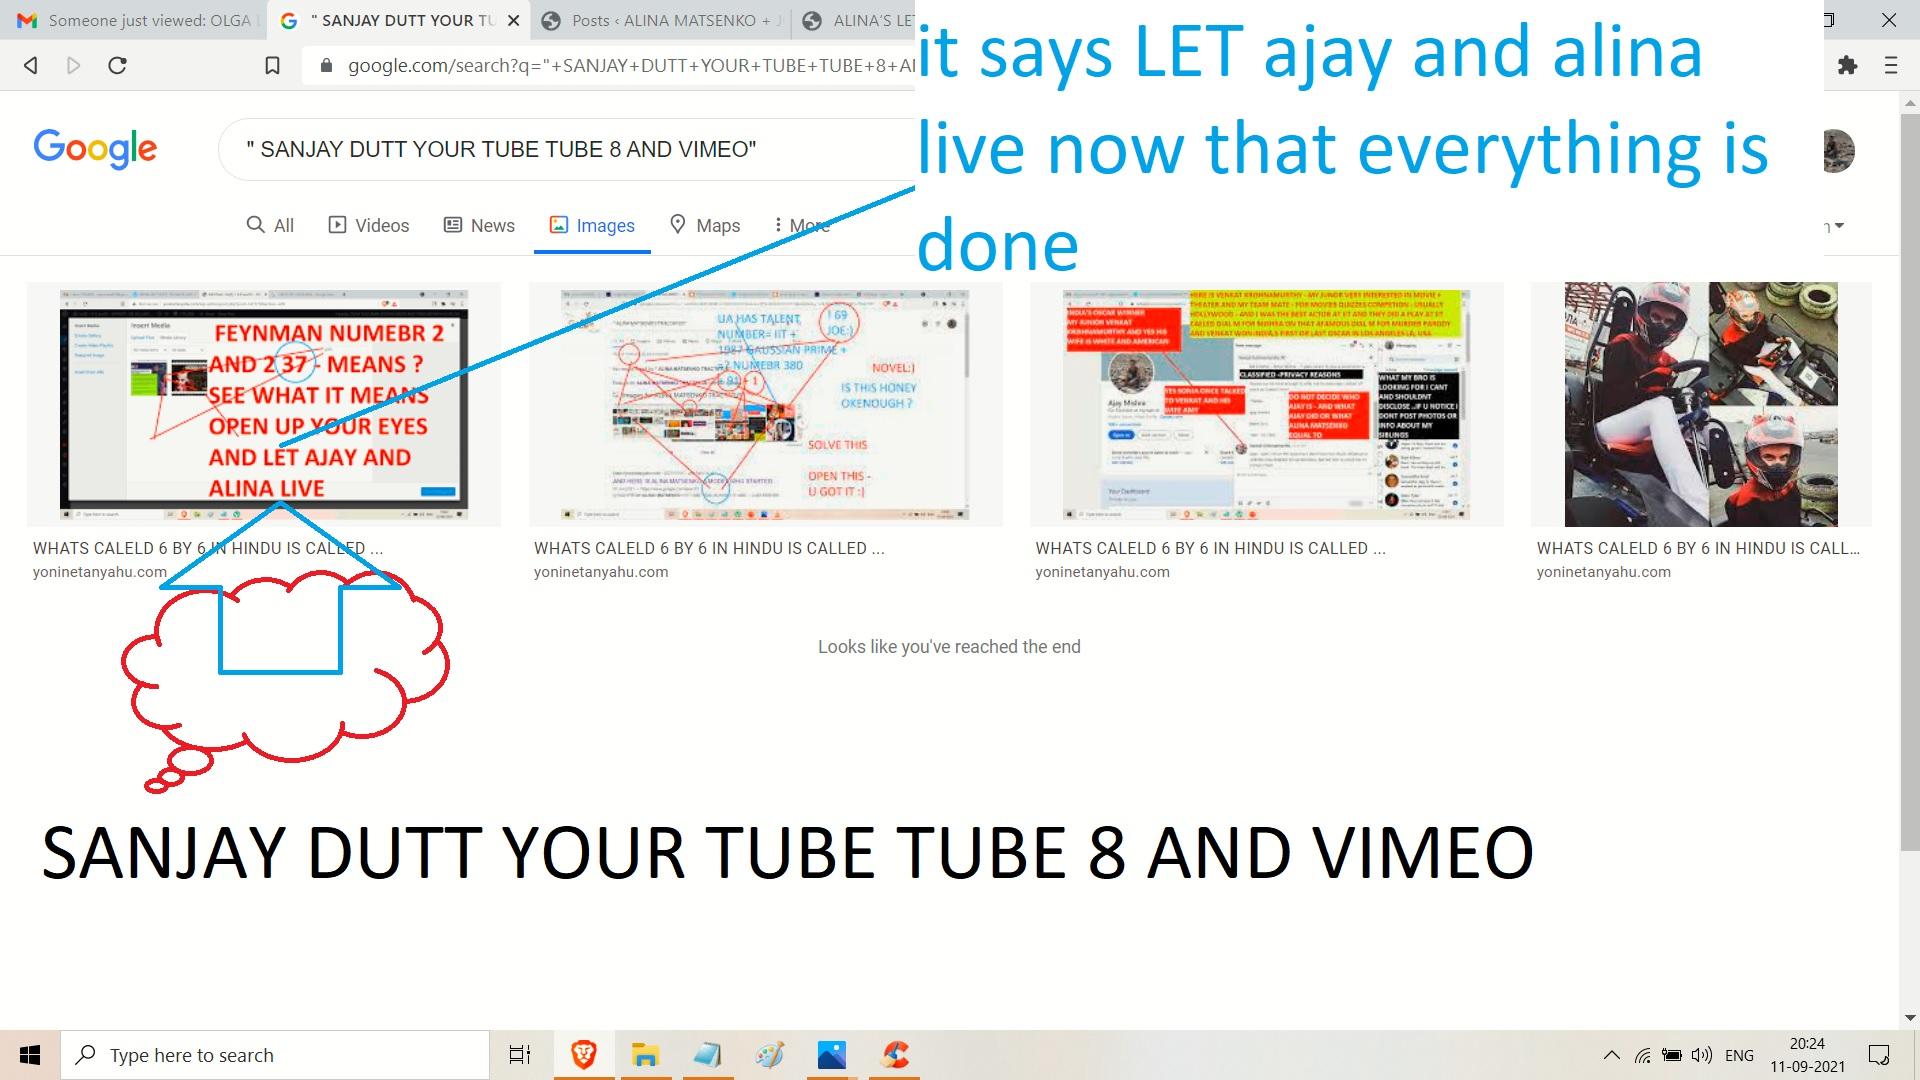 alina matsneko sanjay dut - video and you tube.. and 8